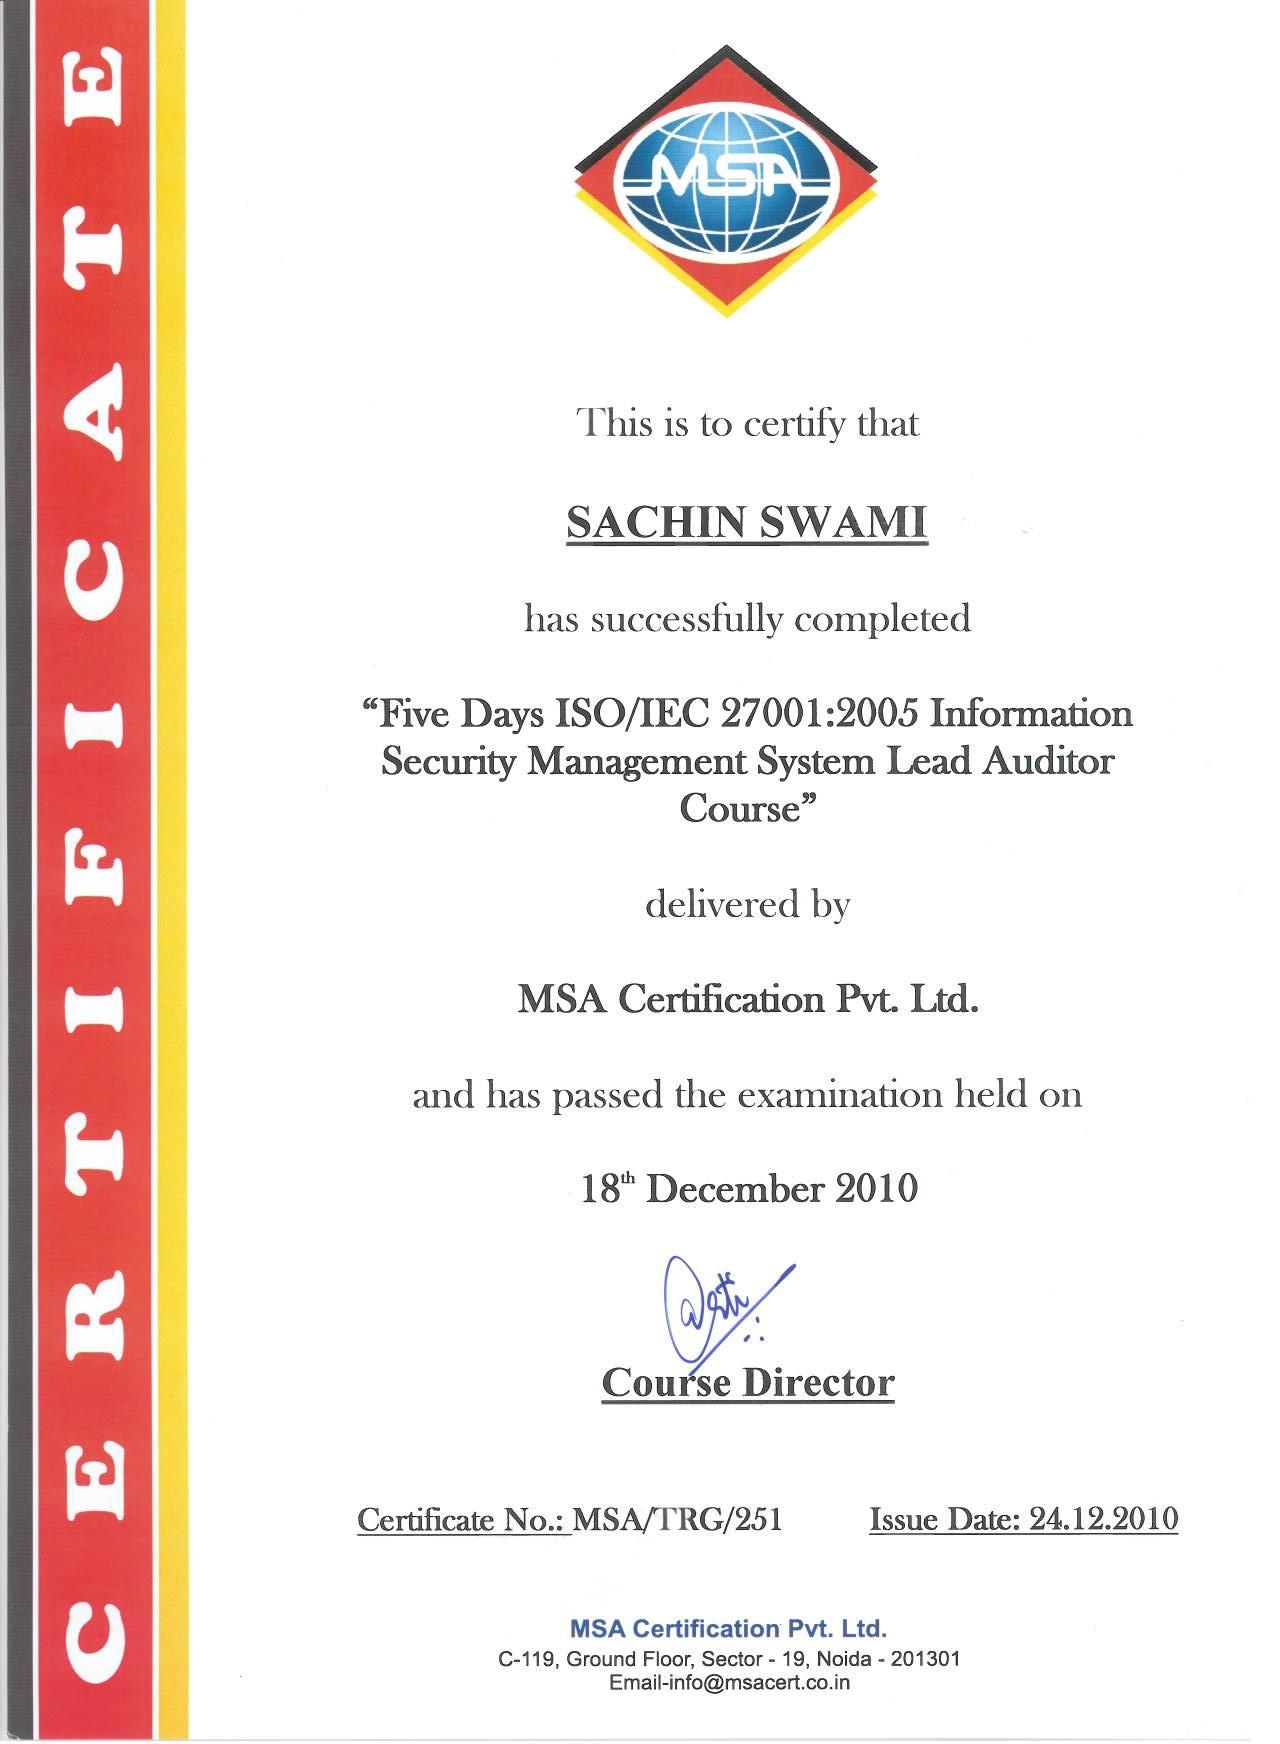 Sachin swami bayt training institute msa certification pvt ltd xflitez Choice Image